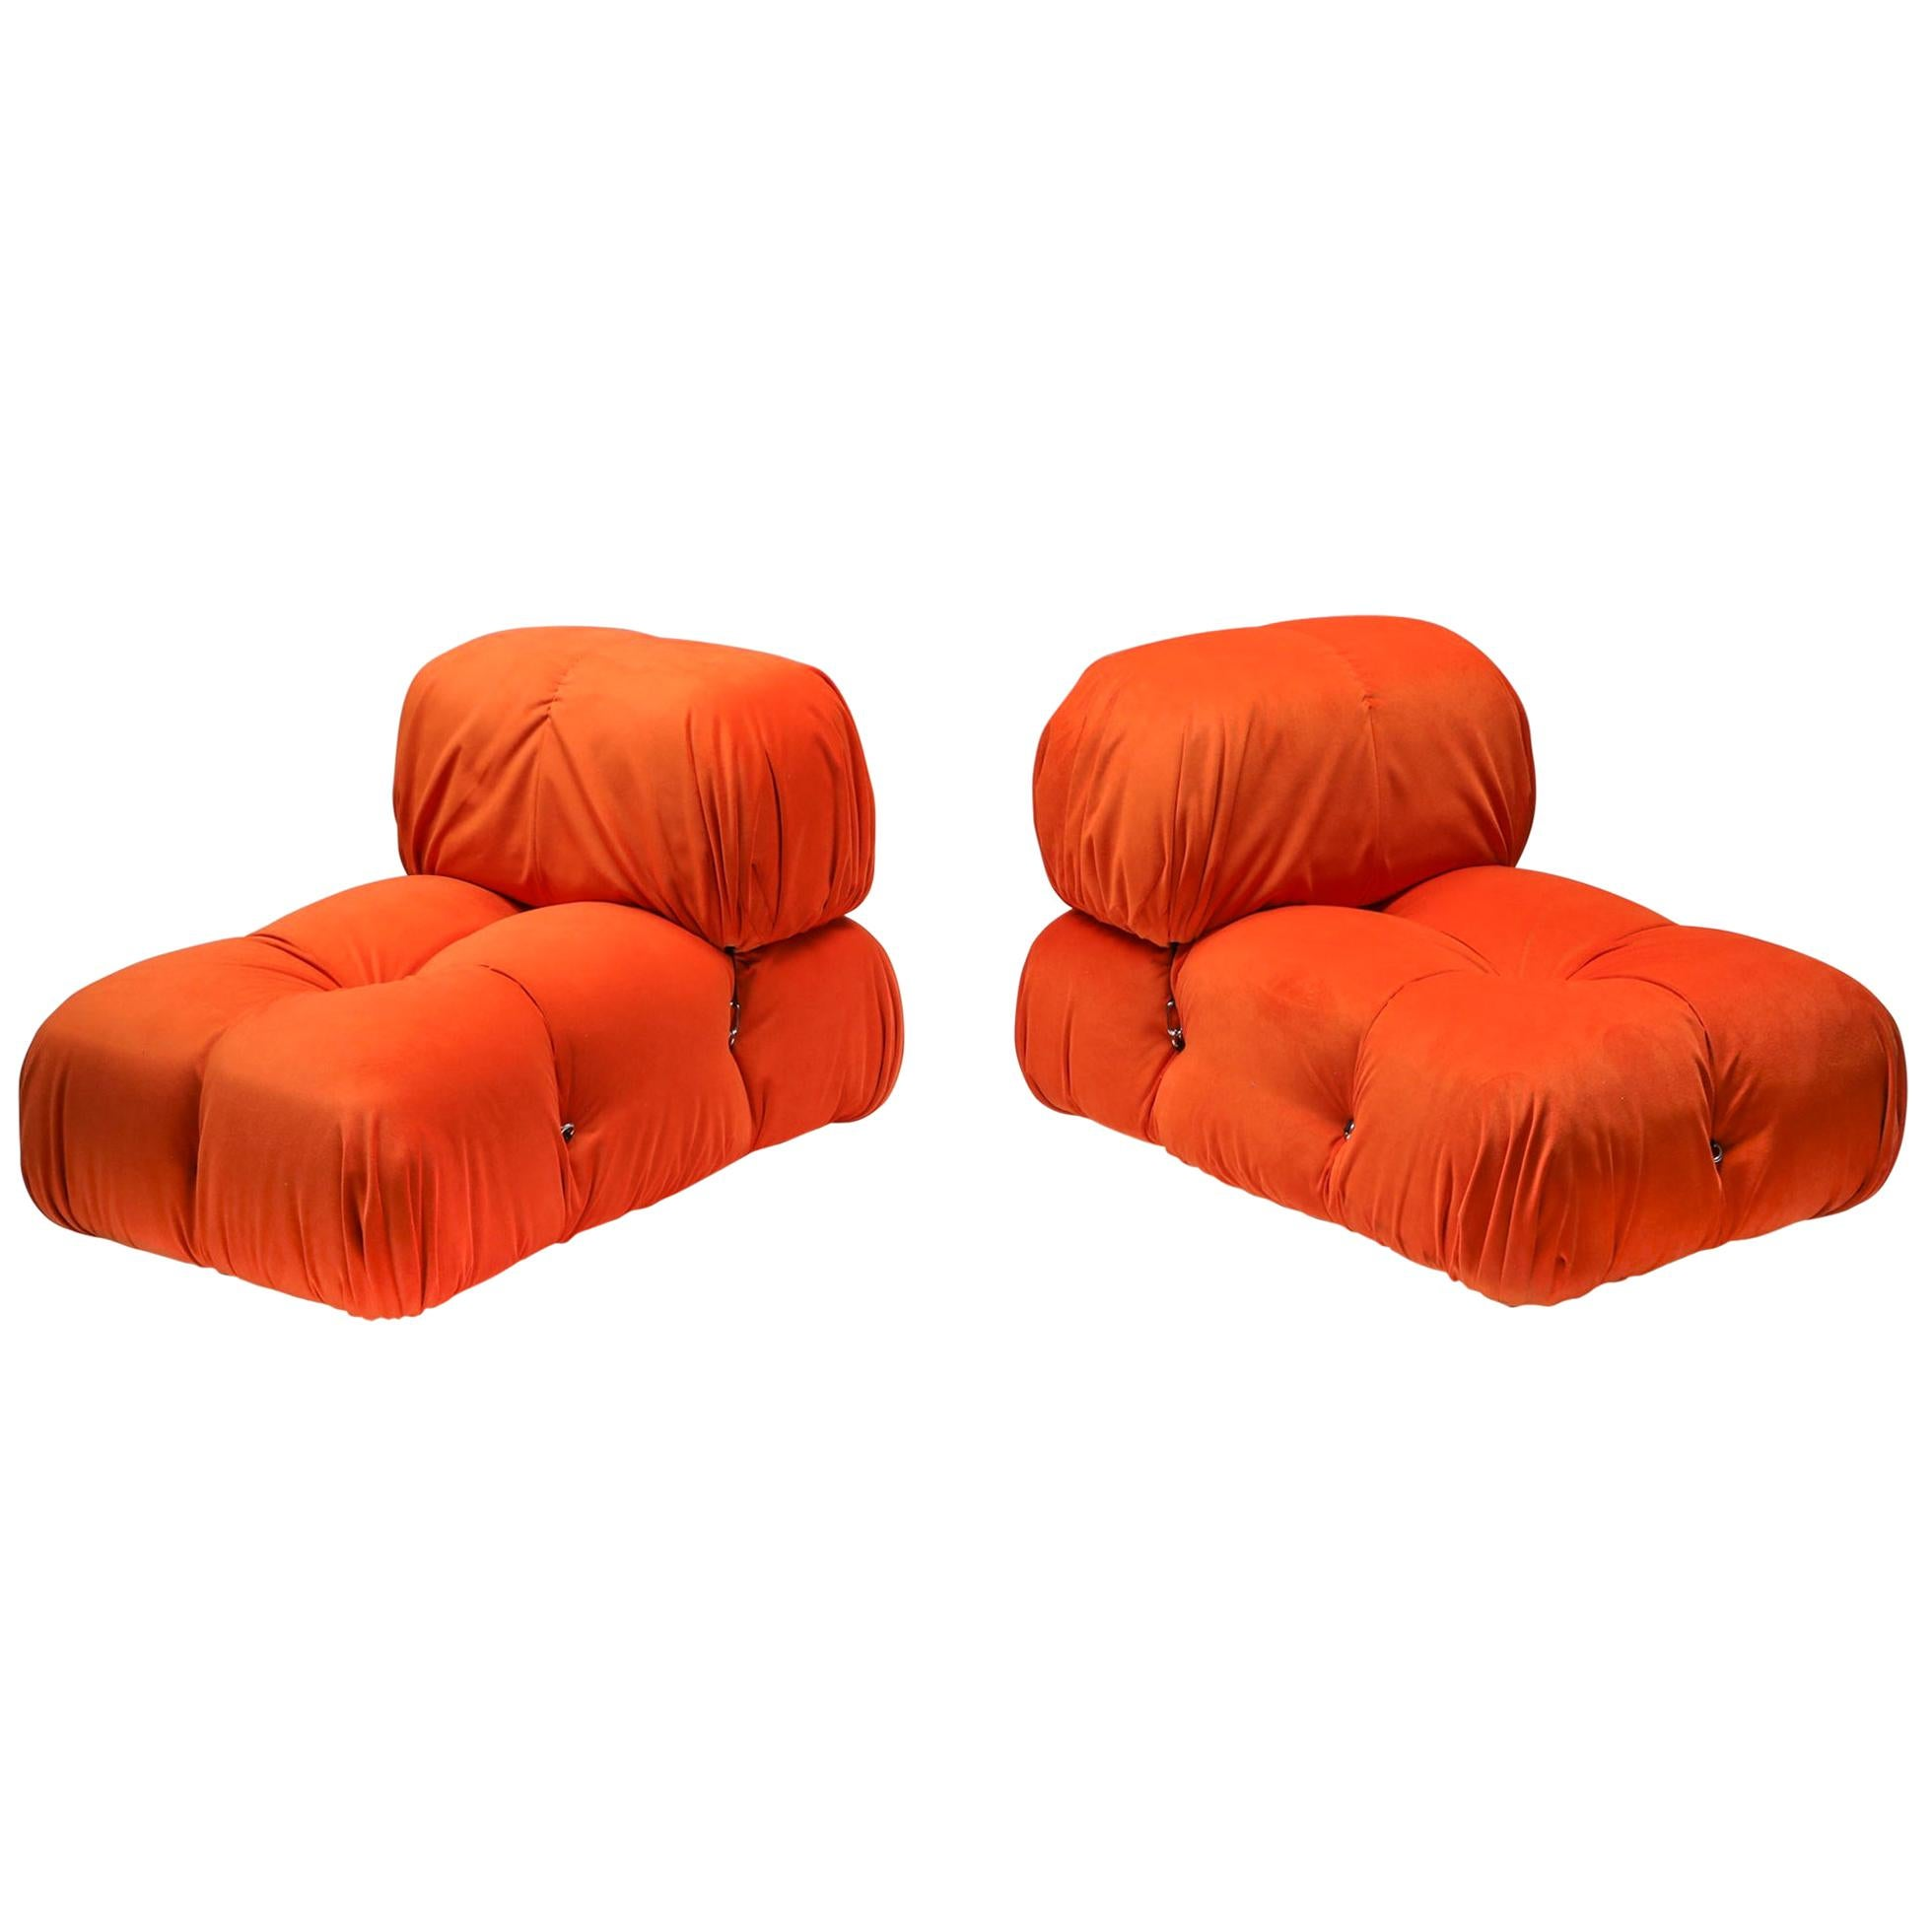 Camaleonda Lounge Chairs in Bright Orange Velvet